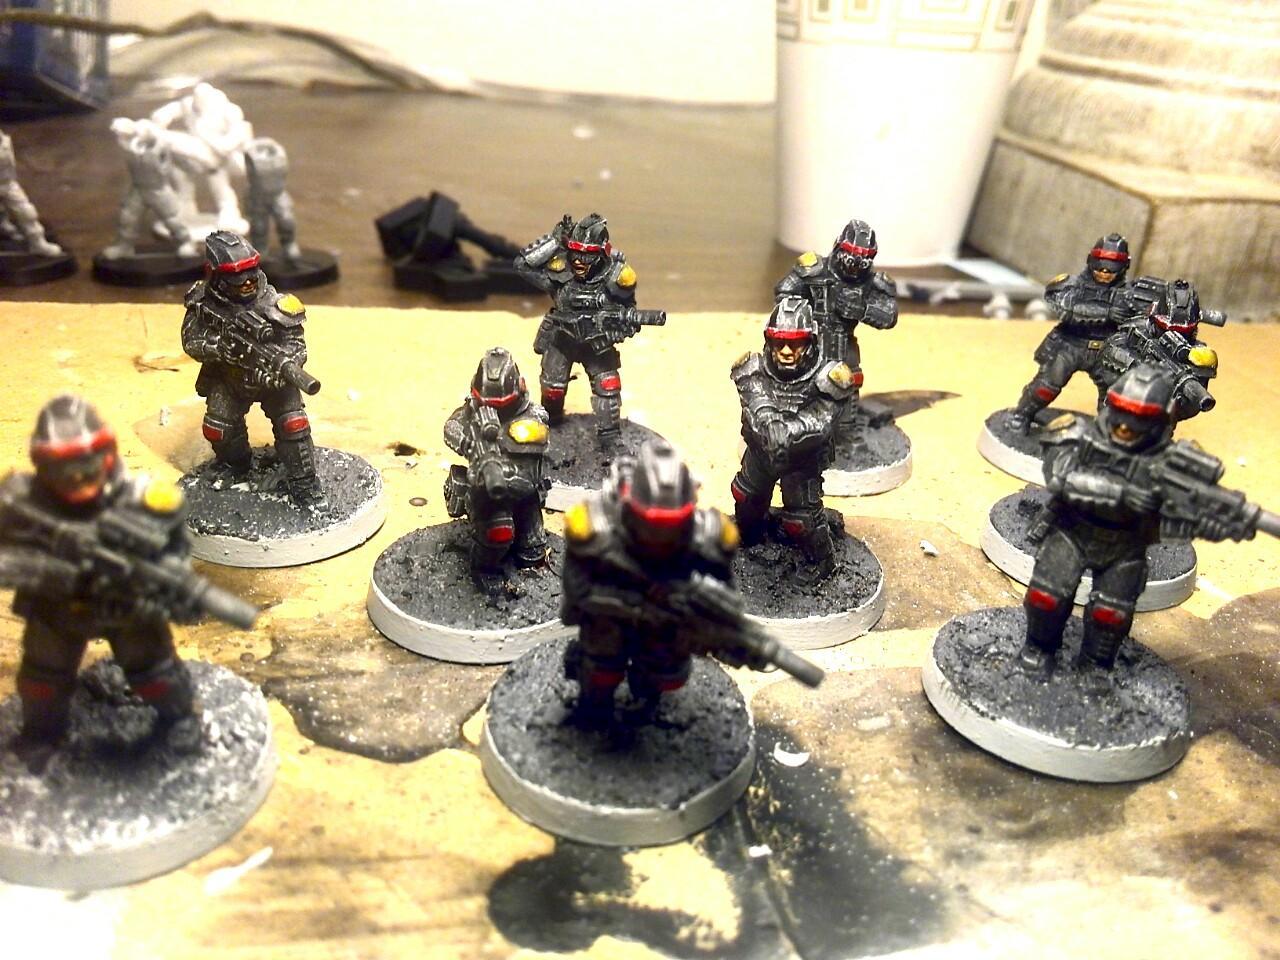 Anvil, Anvil Industries, Dredd, Executioner, Imperial Guard, Judge Dredd, Puppetswar, Unity Council Marines